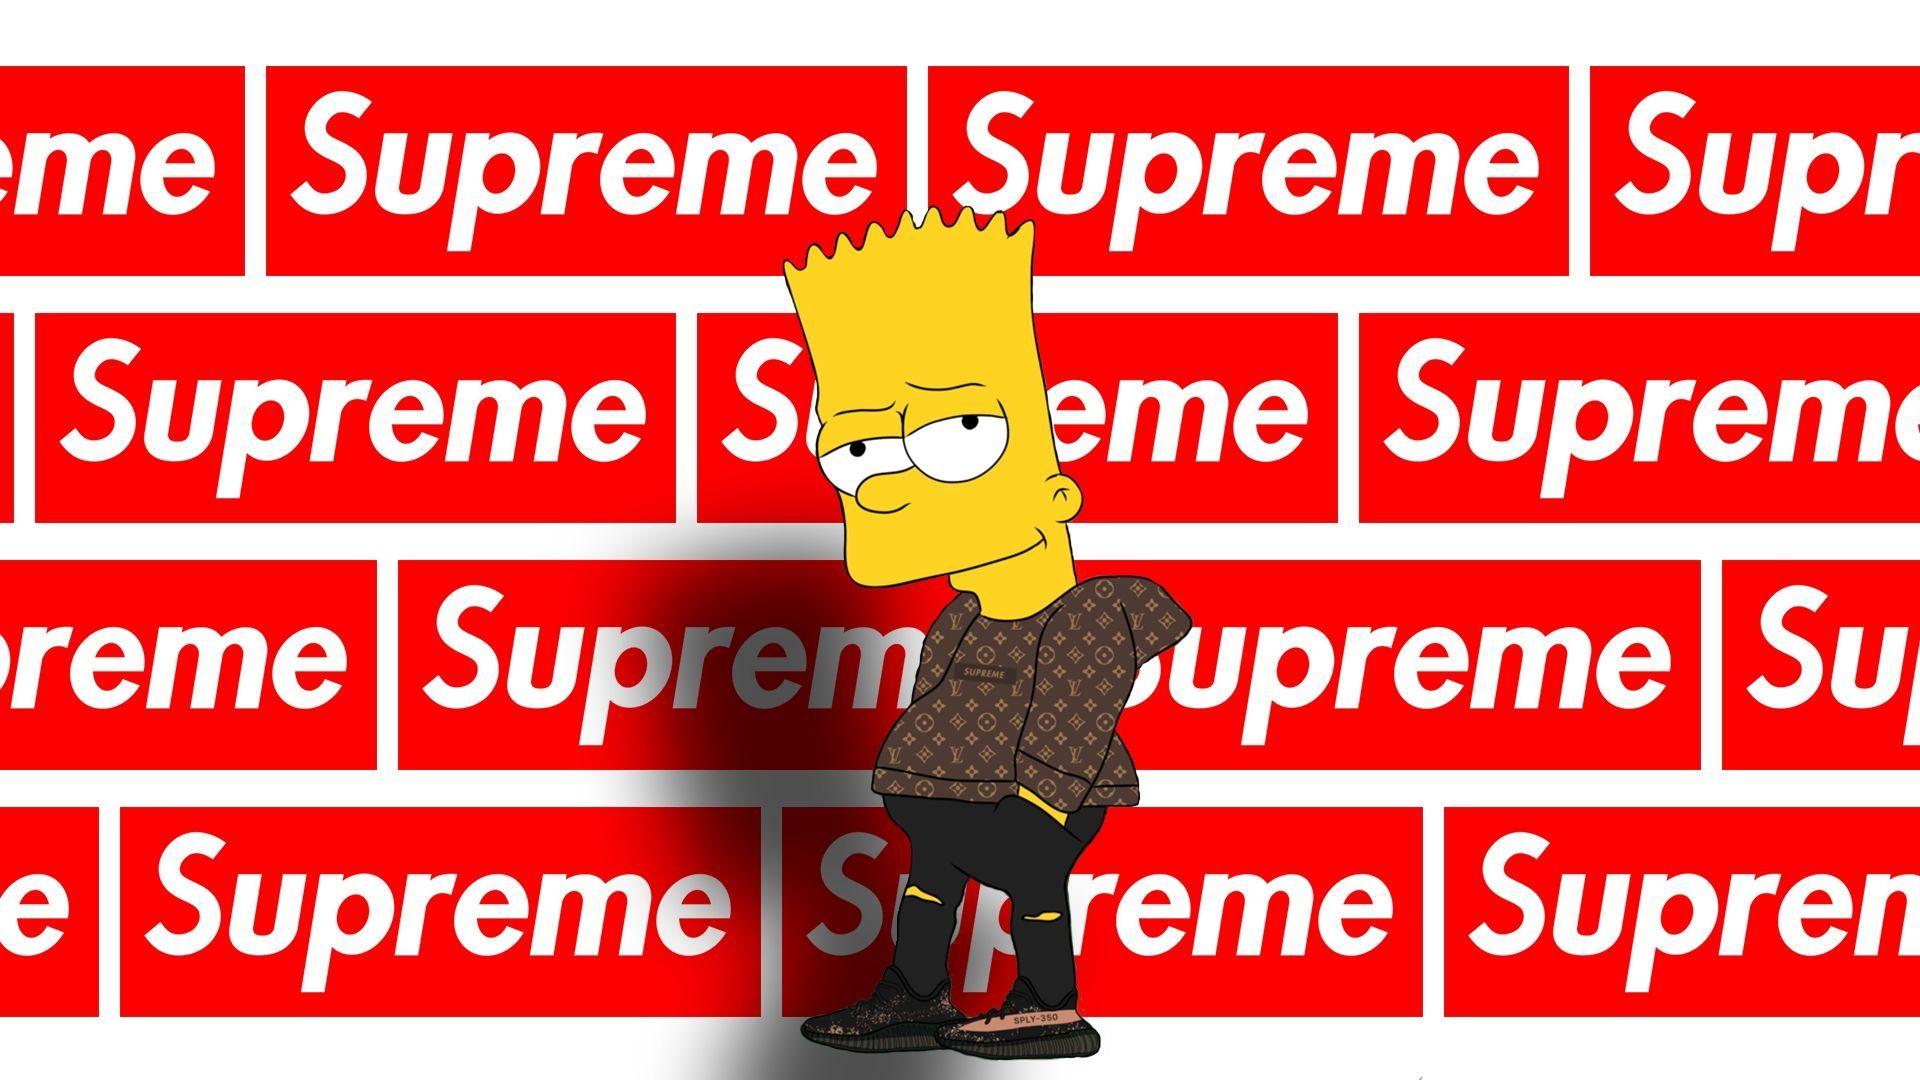 Supreme Bart Wallpapers Wallpaper Cave Intended For Simpsons Supreme Wallpapers Bart Cave Intended In 2020 Supreme Wallpaper Superman Wallpaper Supreme Wallpaper Hd